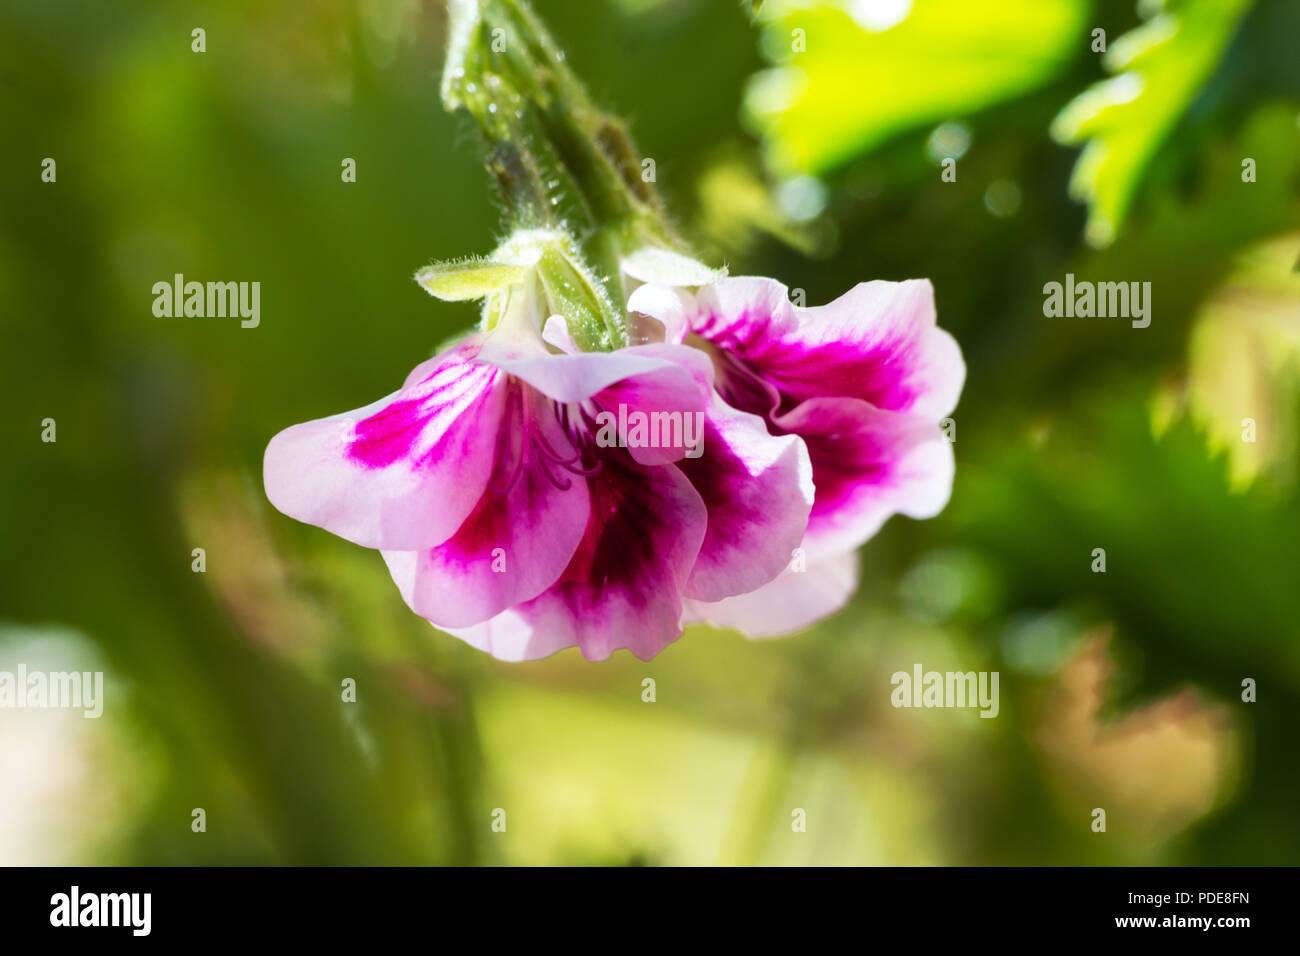 Pelargonium orsett plant and flower on natural background Stock Photo